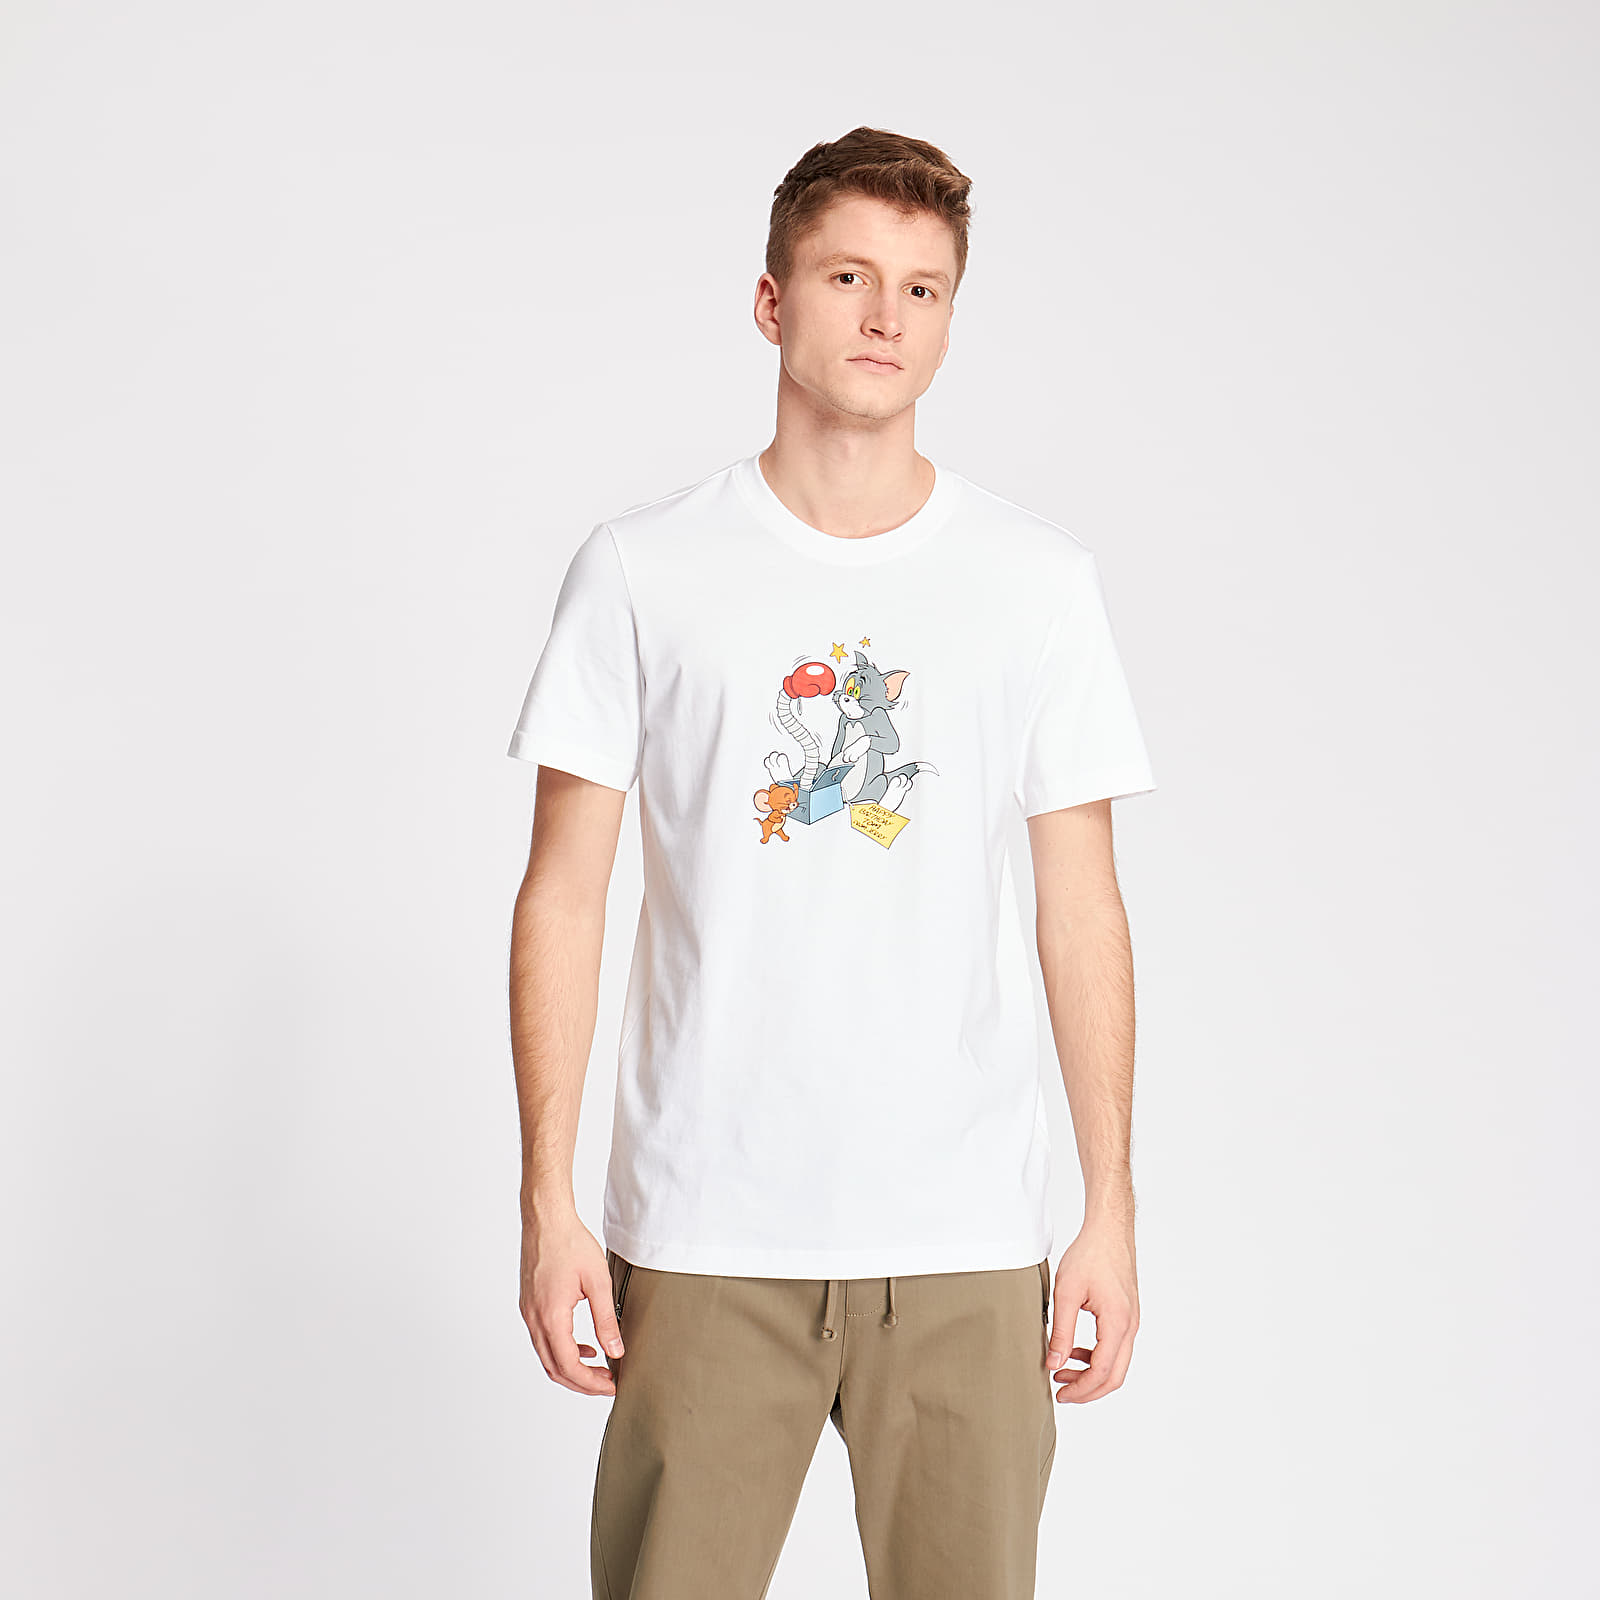 Reebok x Tom & Jerry Tee